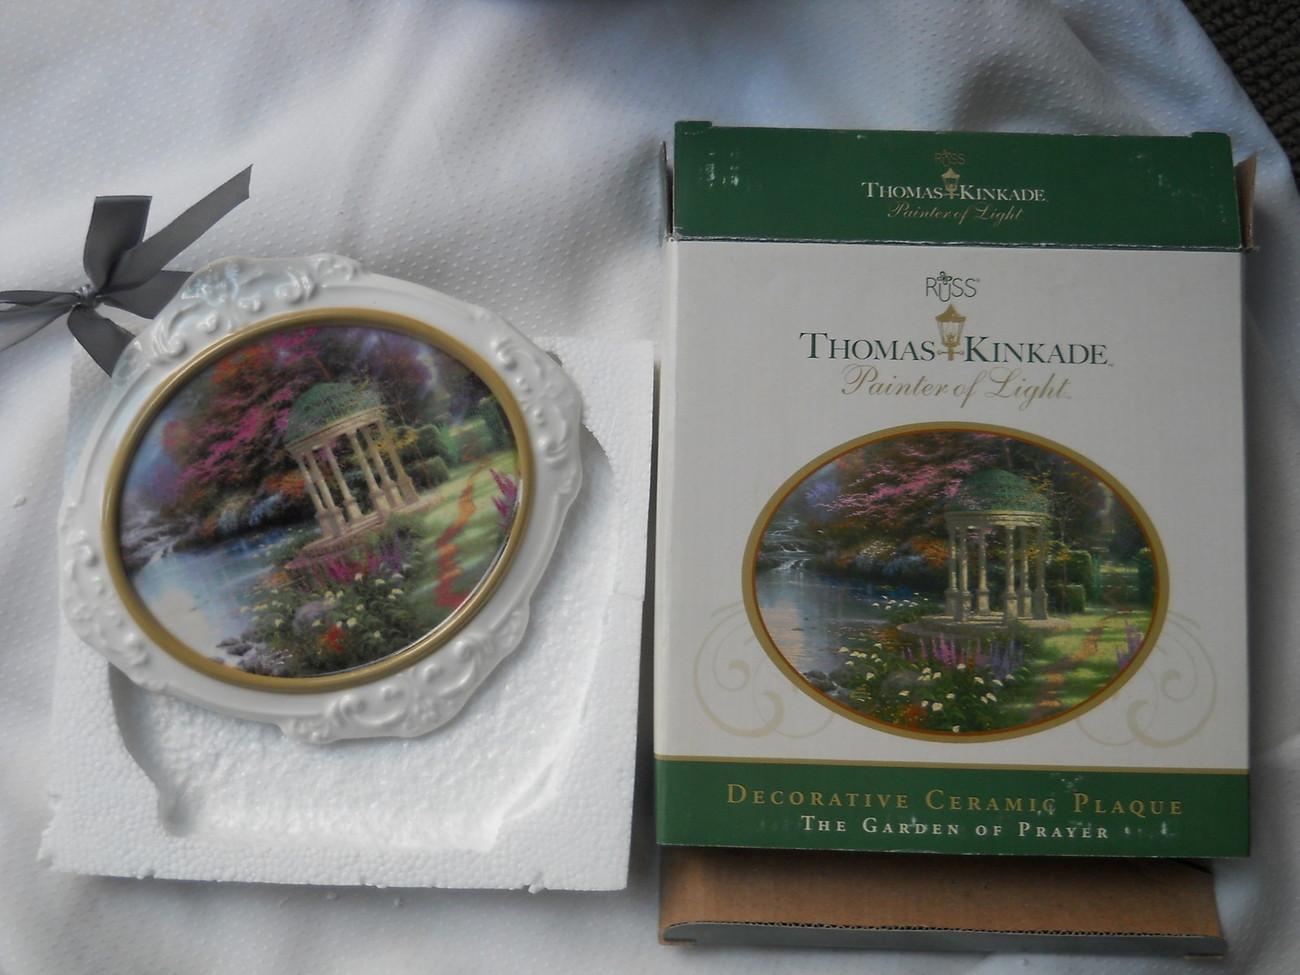 Thomas Kinkade Painter of Light Decorative Ceramic Plaque Plate Garden Prayer NW - $21.83